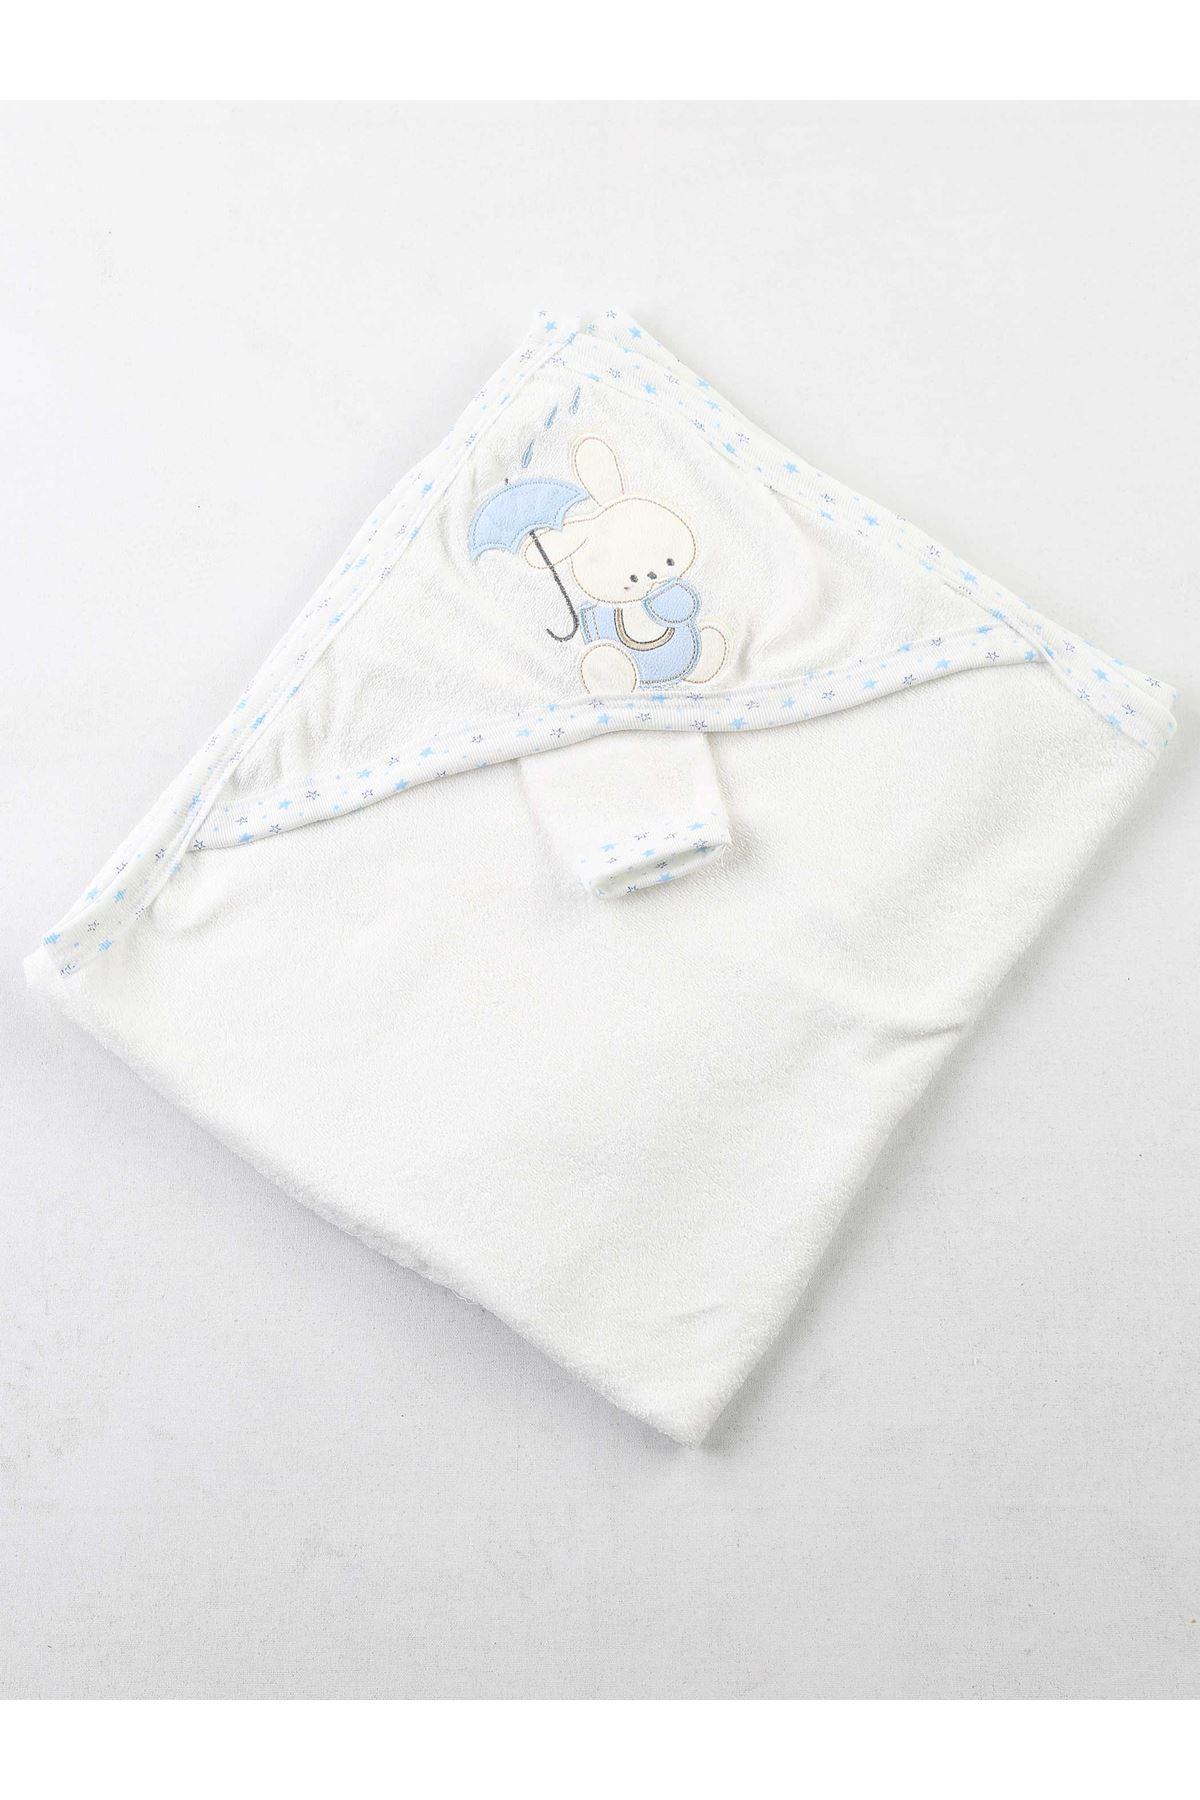 Mavi Beyaz Erkek Bebek Pamuklu Kundak Banyo Havlusu